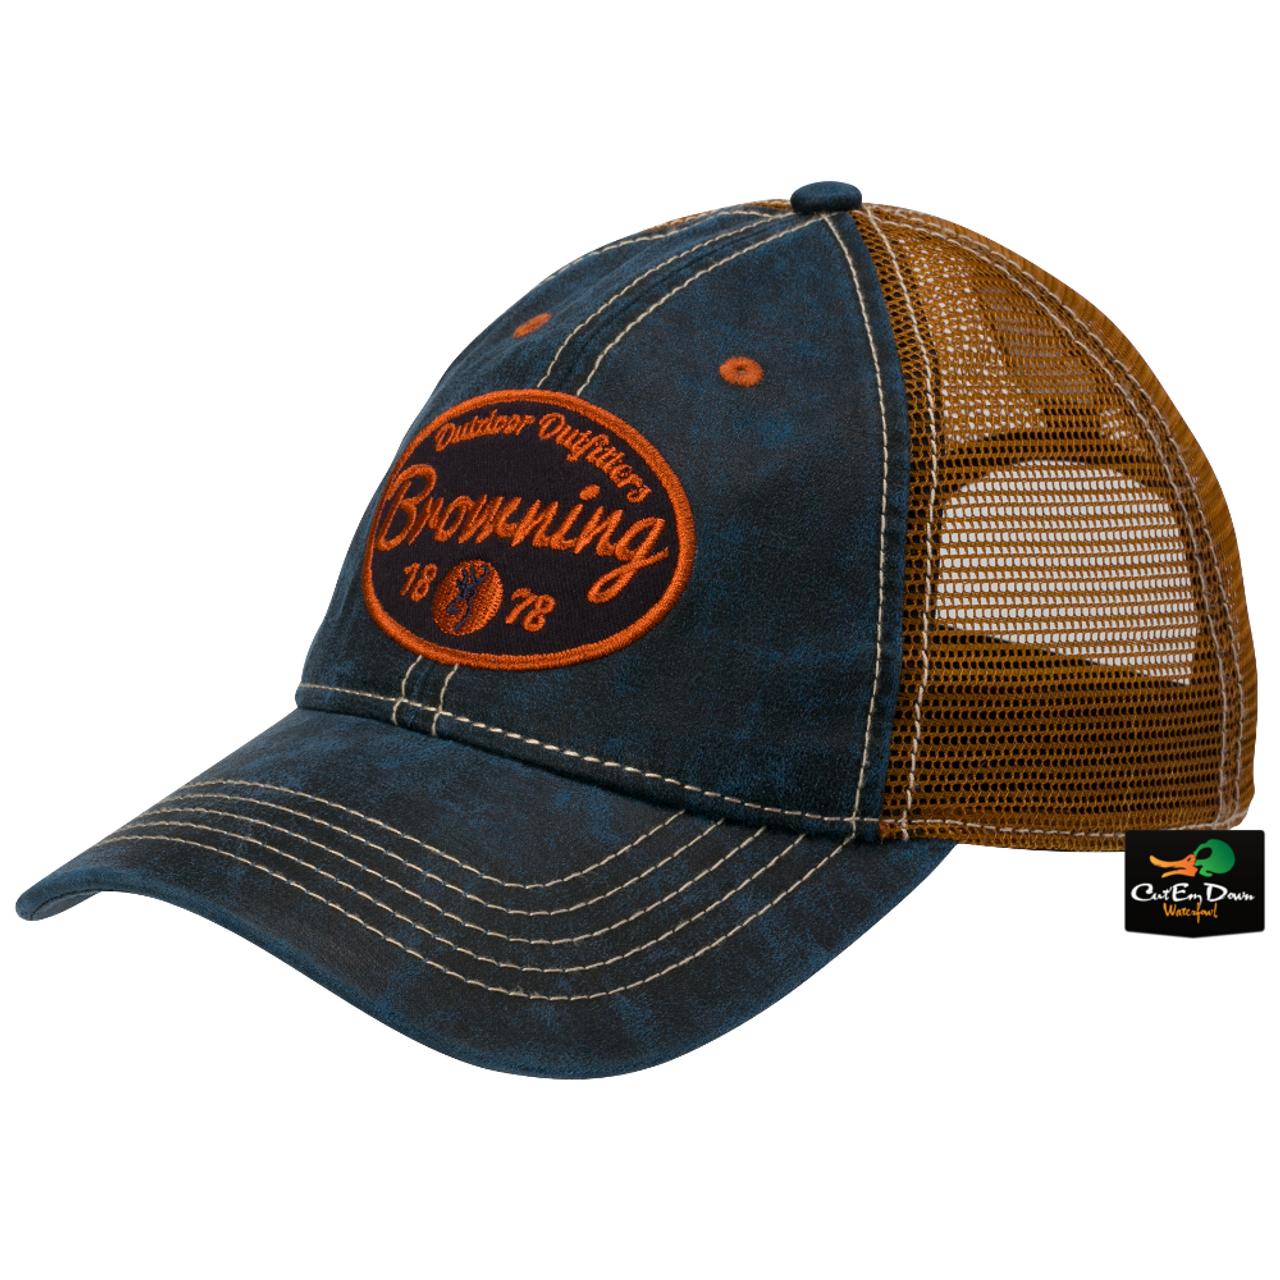 009f5b45ea0cf NEW BROWNING COOPER BUCKET HAT BOONIE CAP BUCKMARK LOGO BROWN Clothing